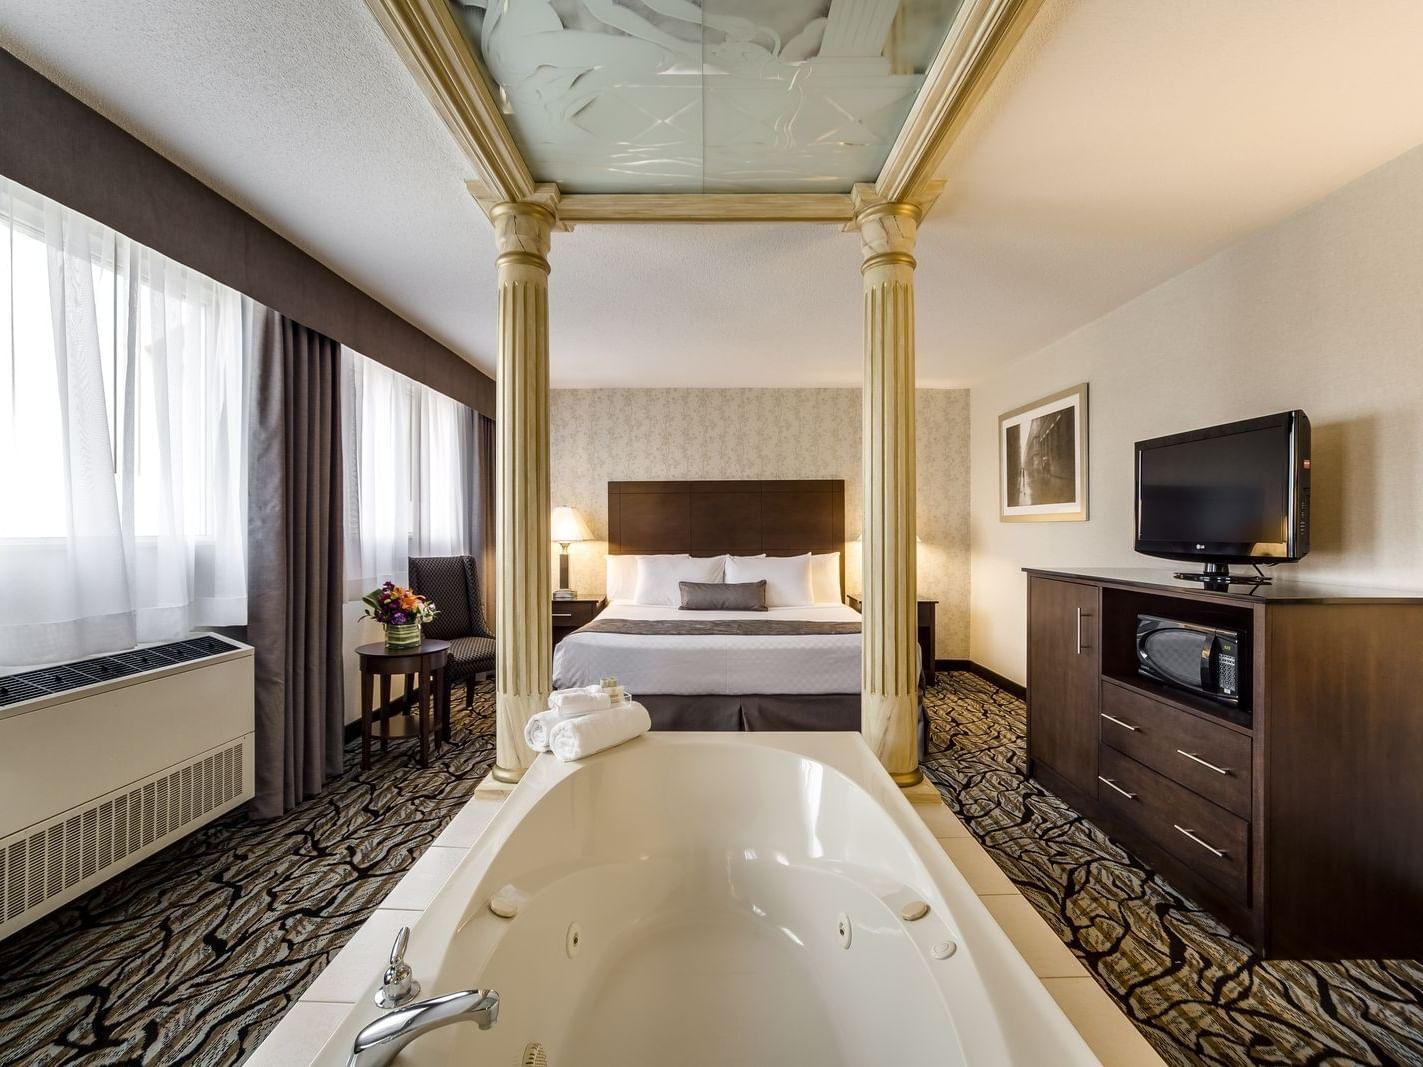 Queen Jacuzzi Suite -  Monte Carlo Inns Oakville Suites